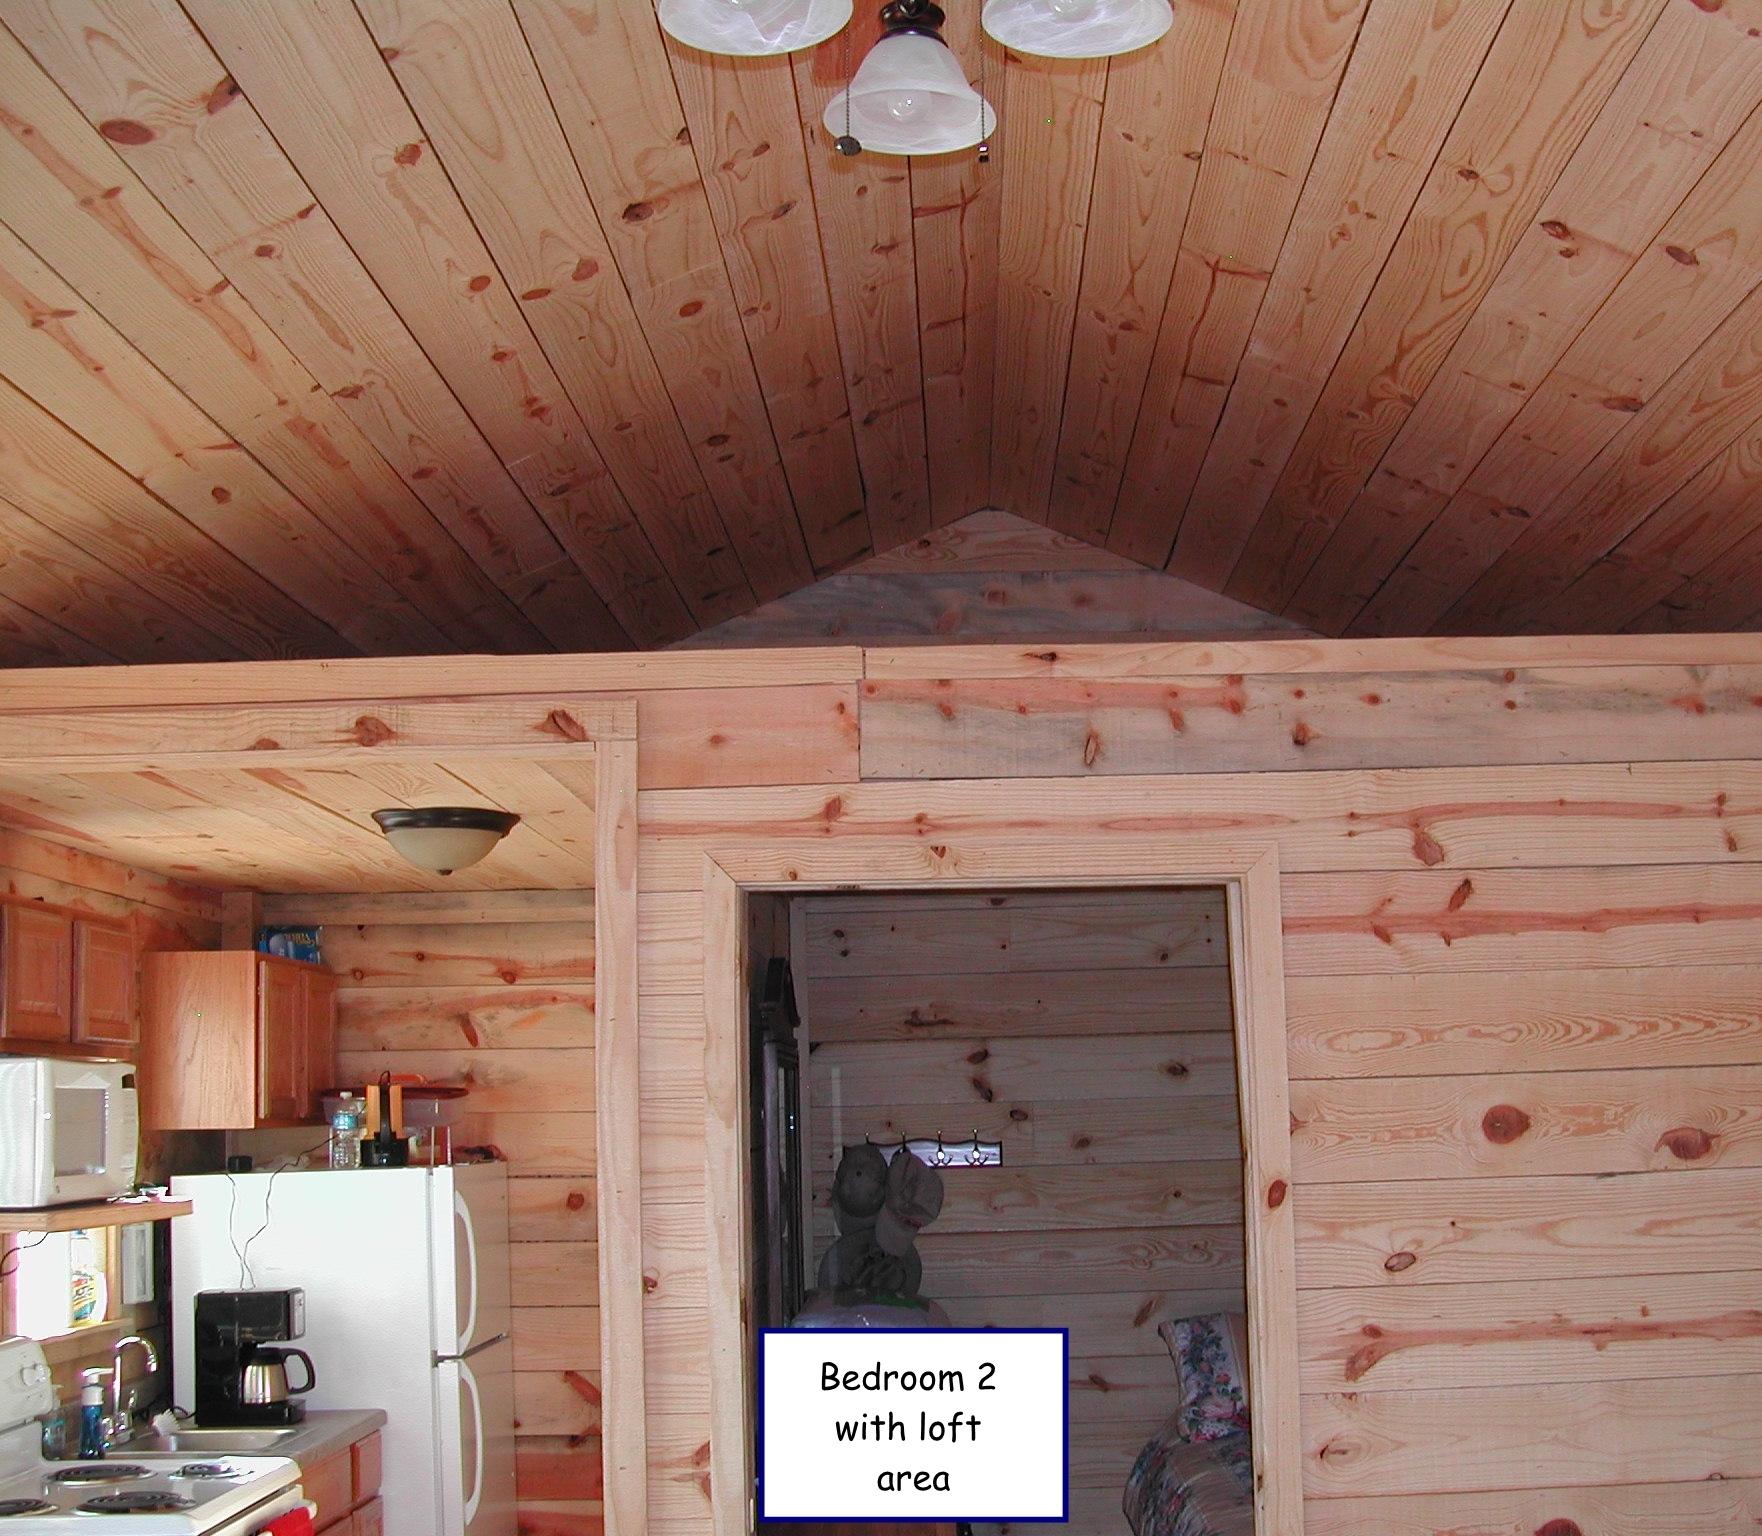 Bedroom 2 wt loft